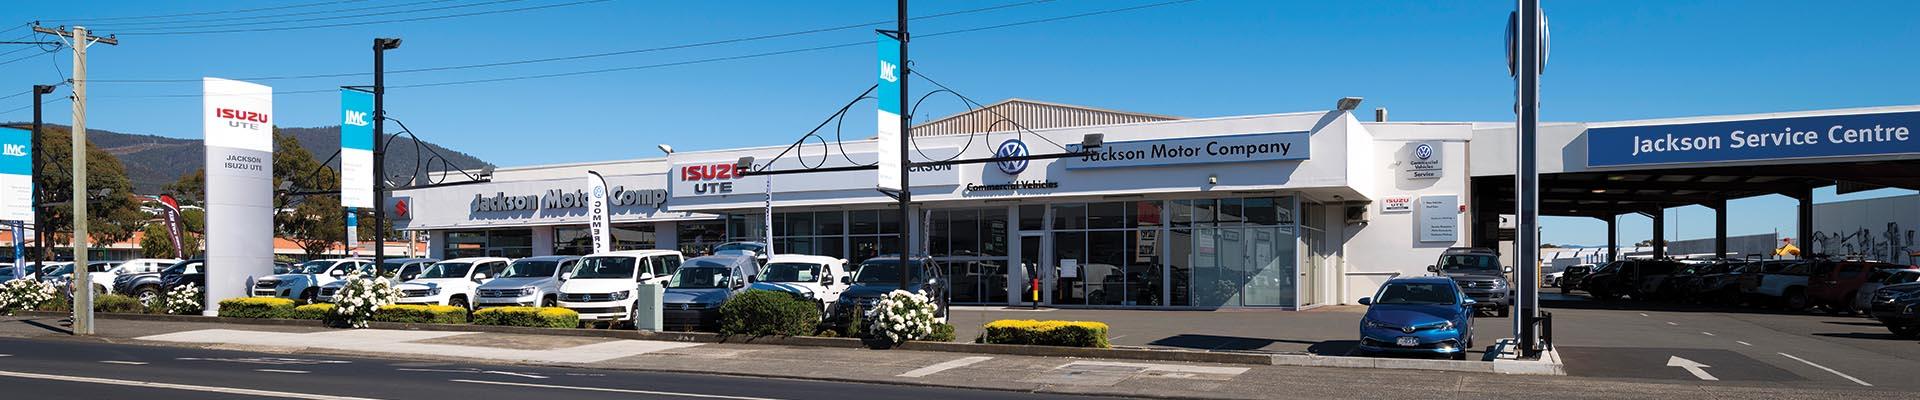 Jackson Motor Company-Derwent Park